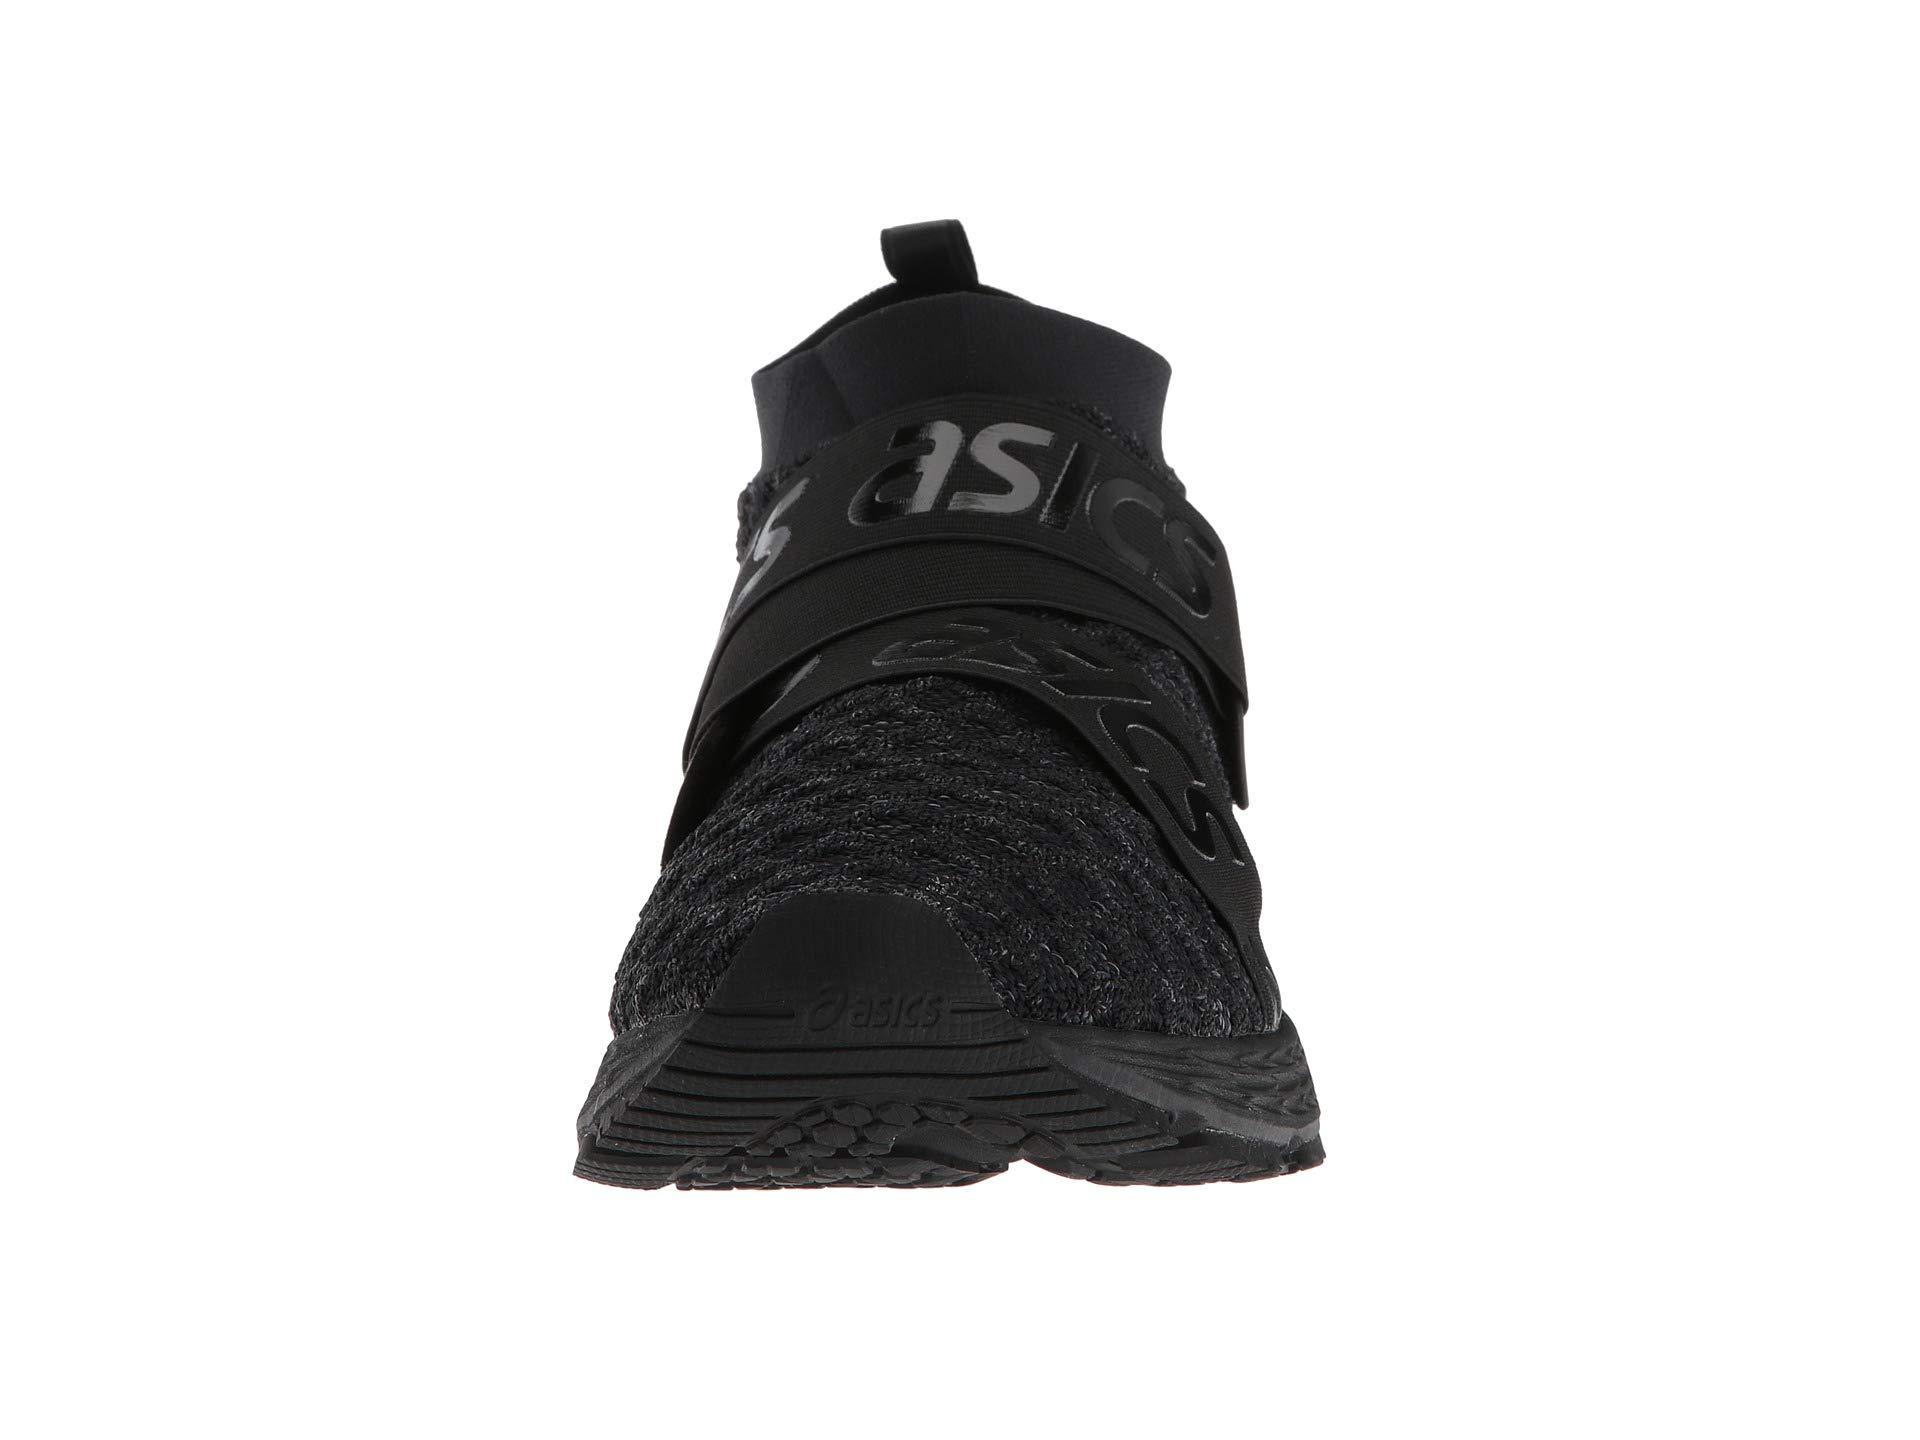 61P0urhhQyL - ASICS Mens Gel-Kayano 25 Obistag Black/Carbon Running Shoe - 9